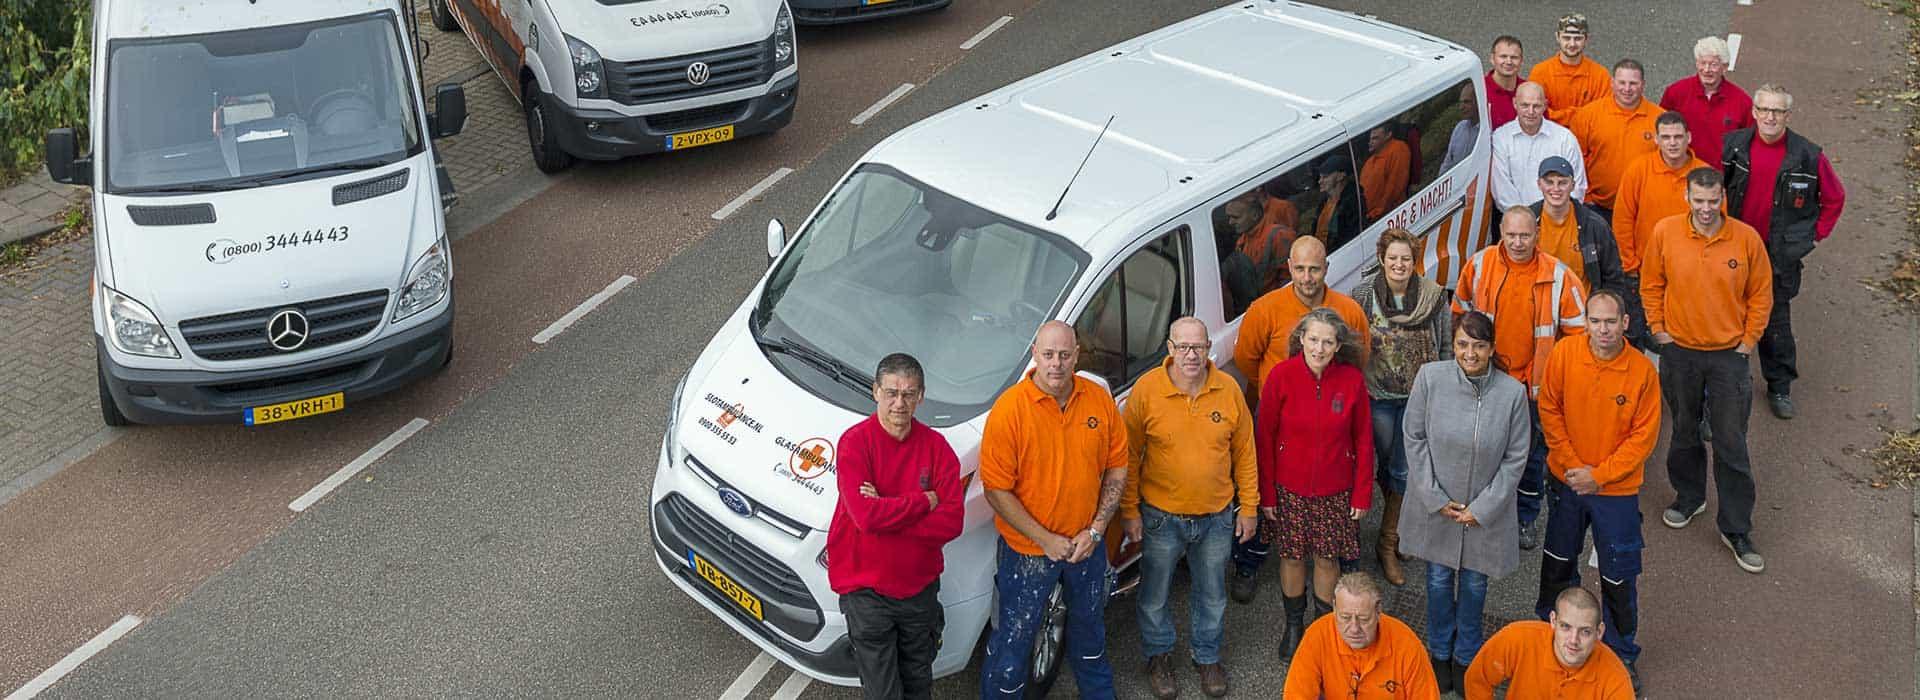 Slotambulance slotenmaker team